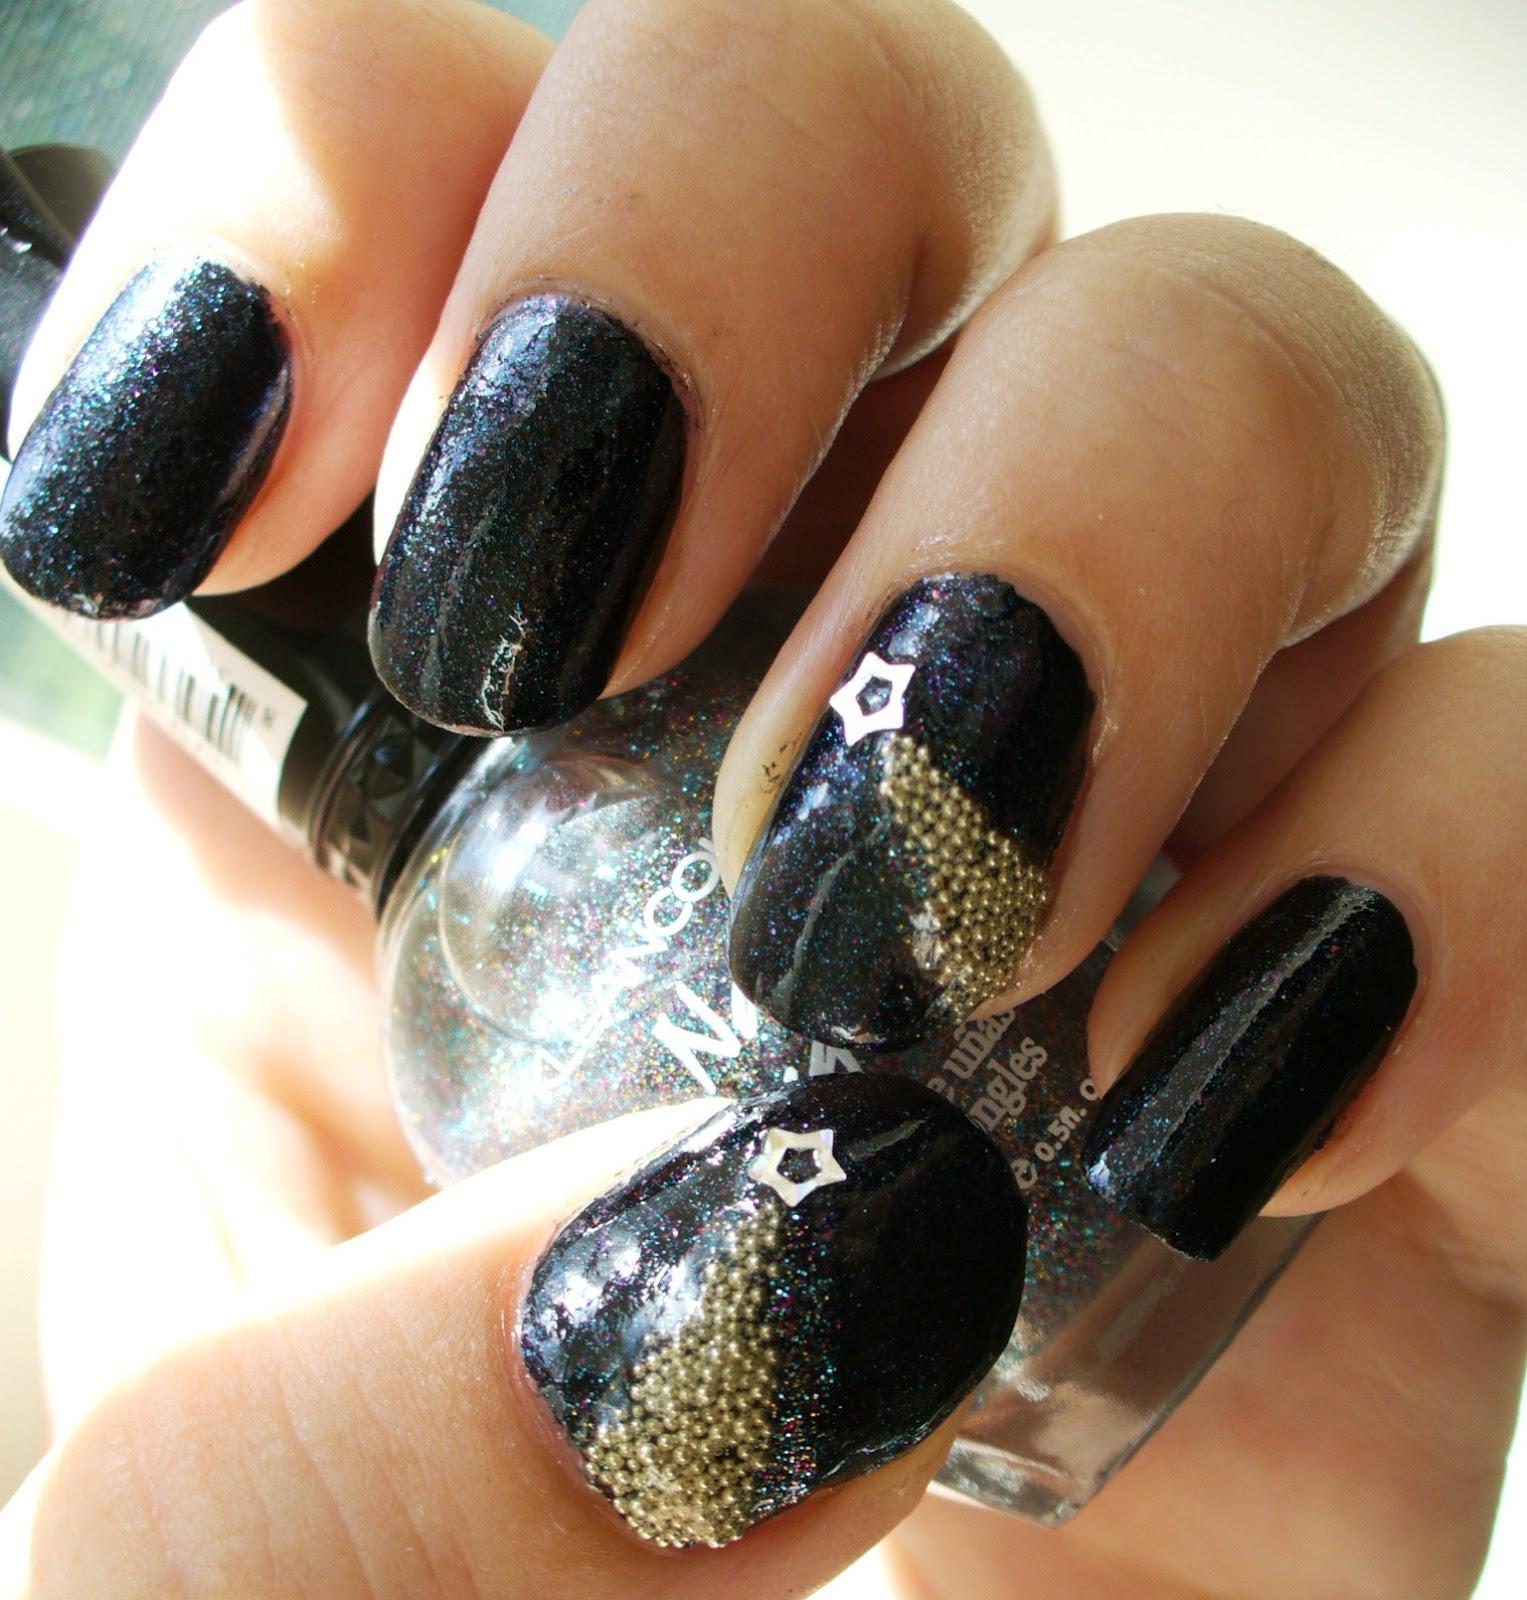 Creatique Caviar Nails En Gewone Mooie Nagels